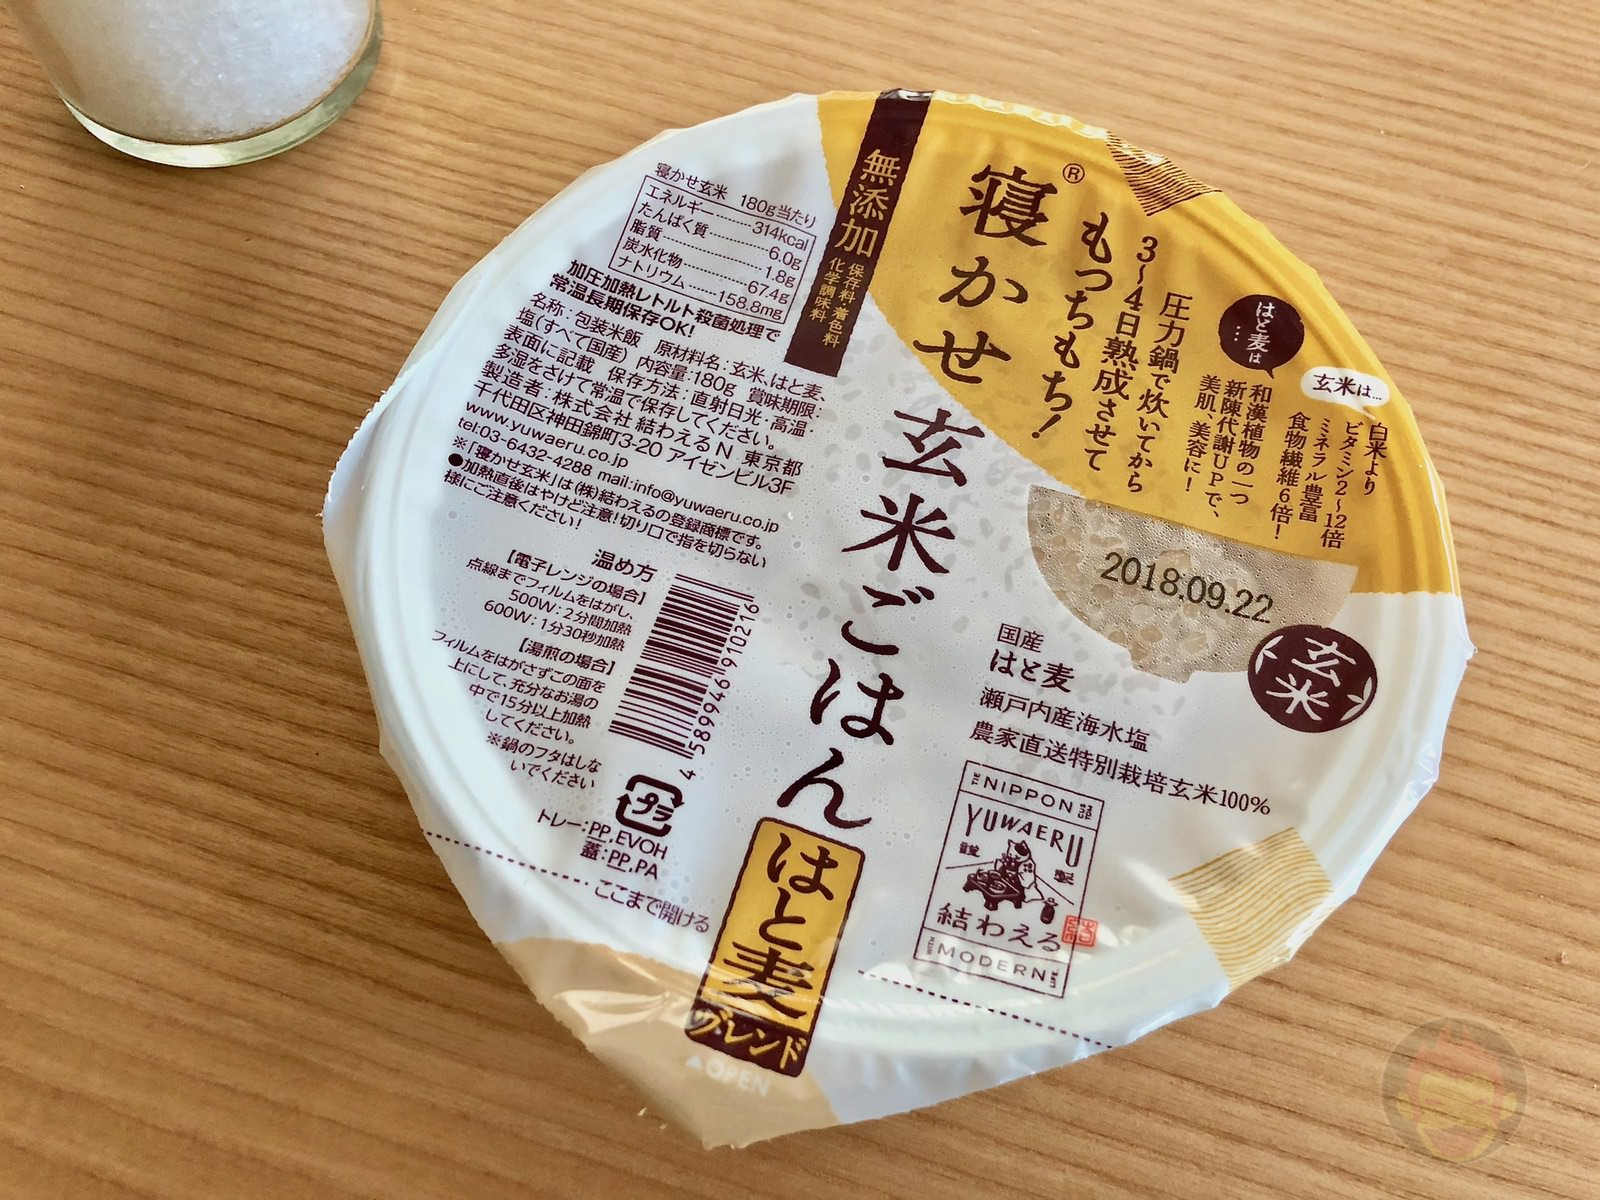 Nekase Genmai Yuwaeru Package 02